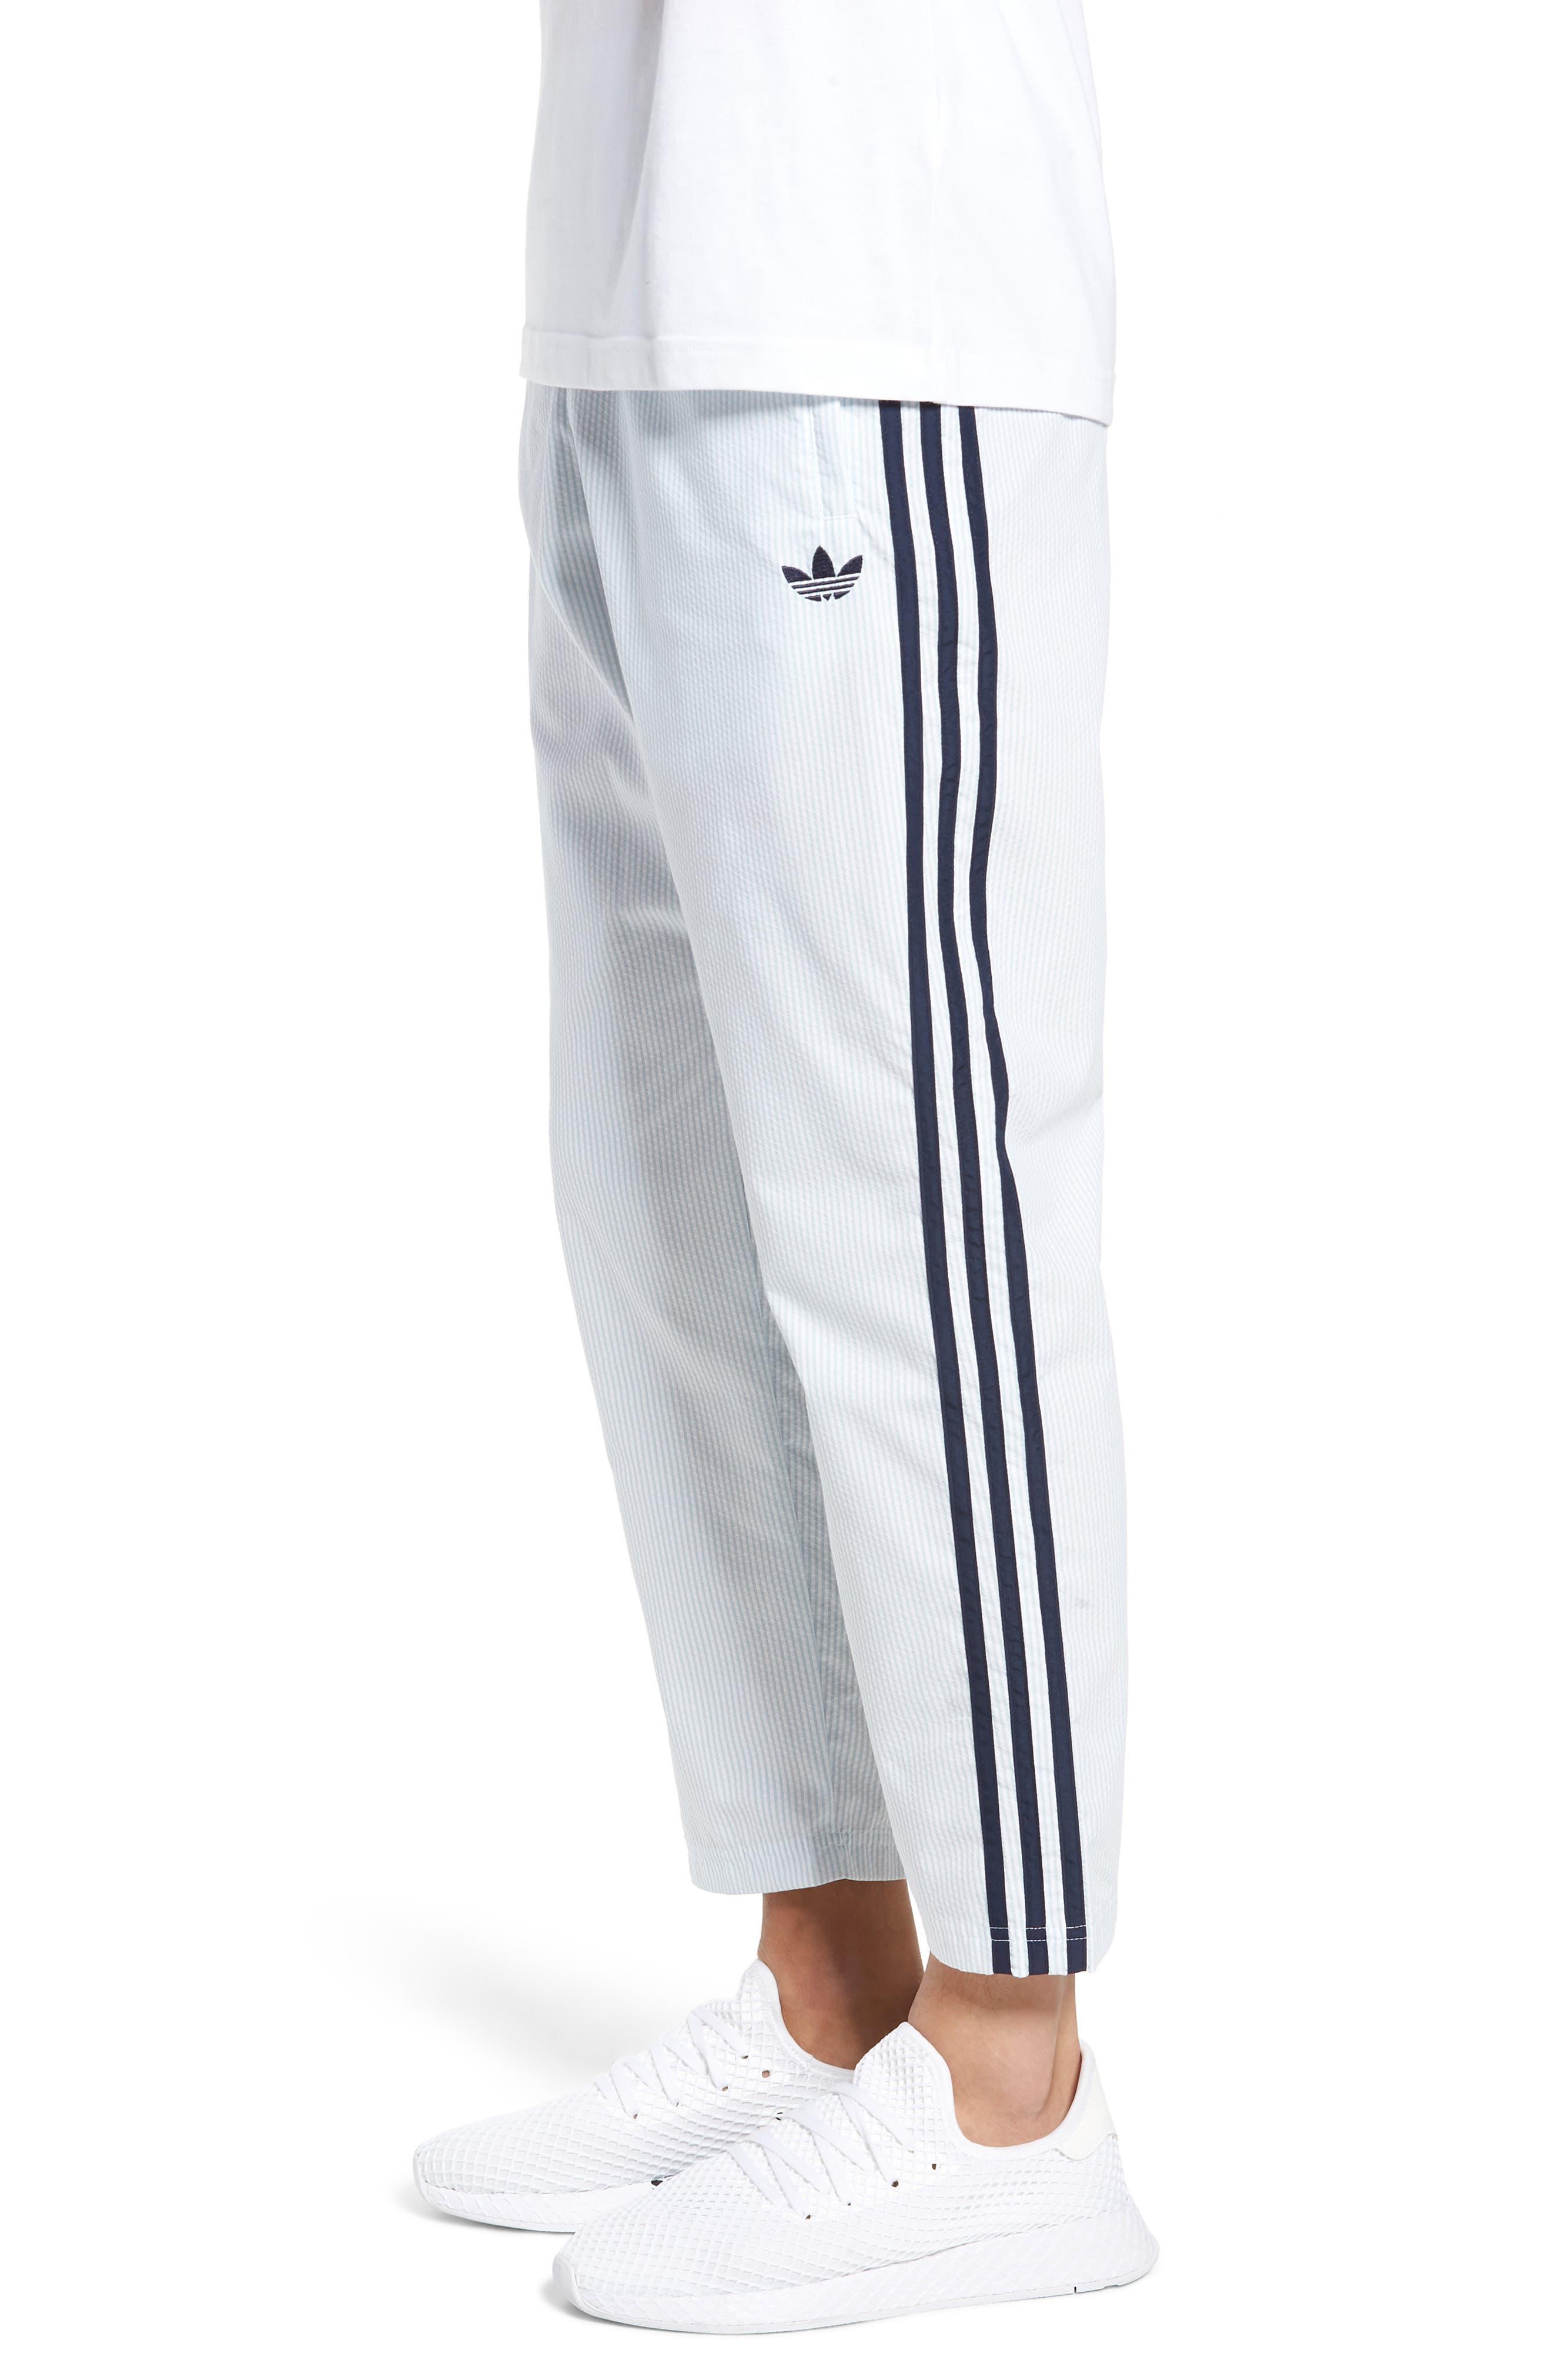 ADIDAS ORIGINALS, Seersucker Track Pants, Alternate thumbnail 4, color, ASH GREY/ WHITE